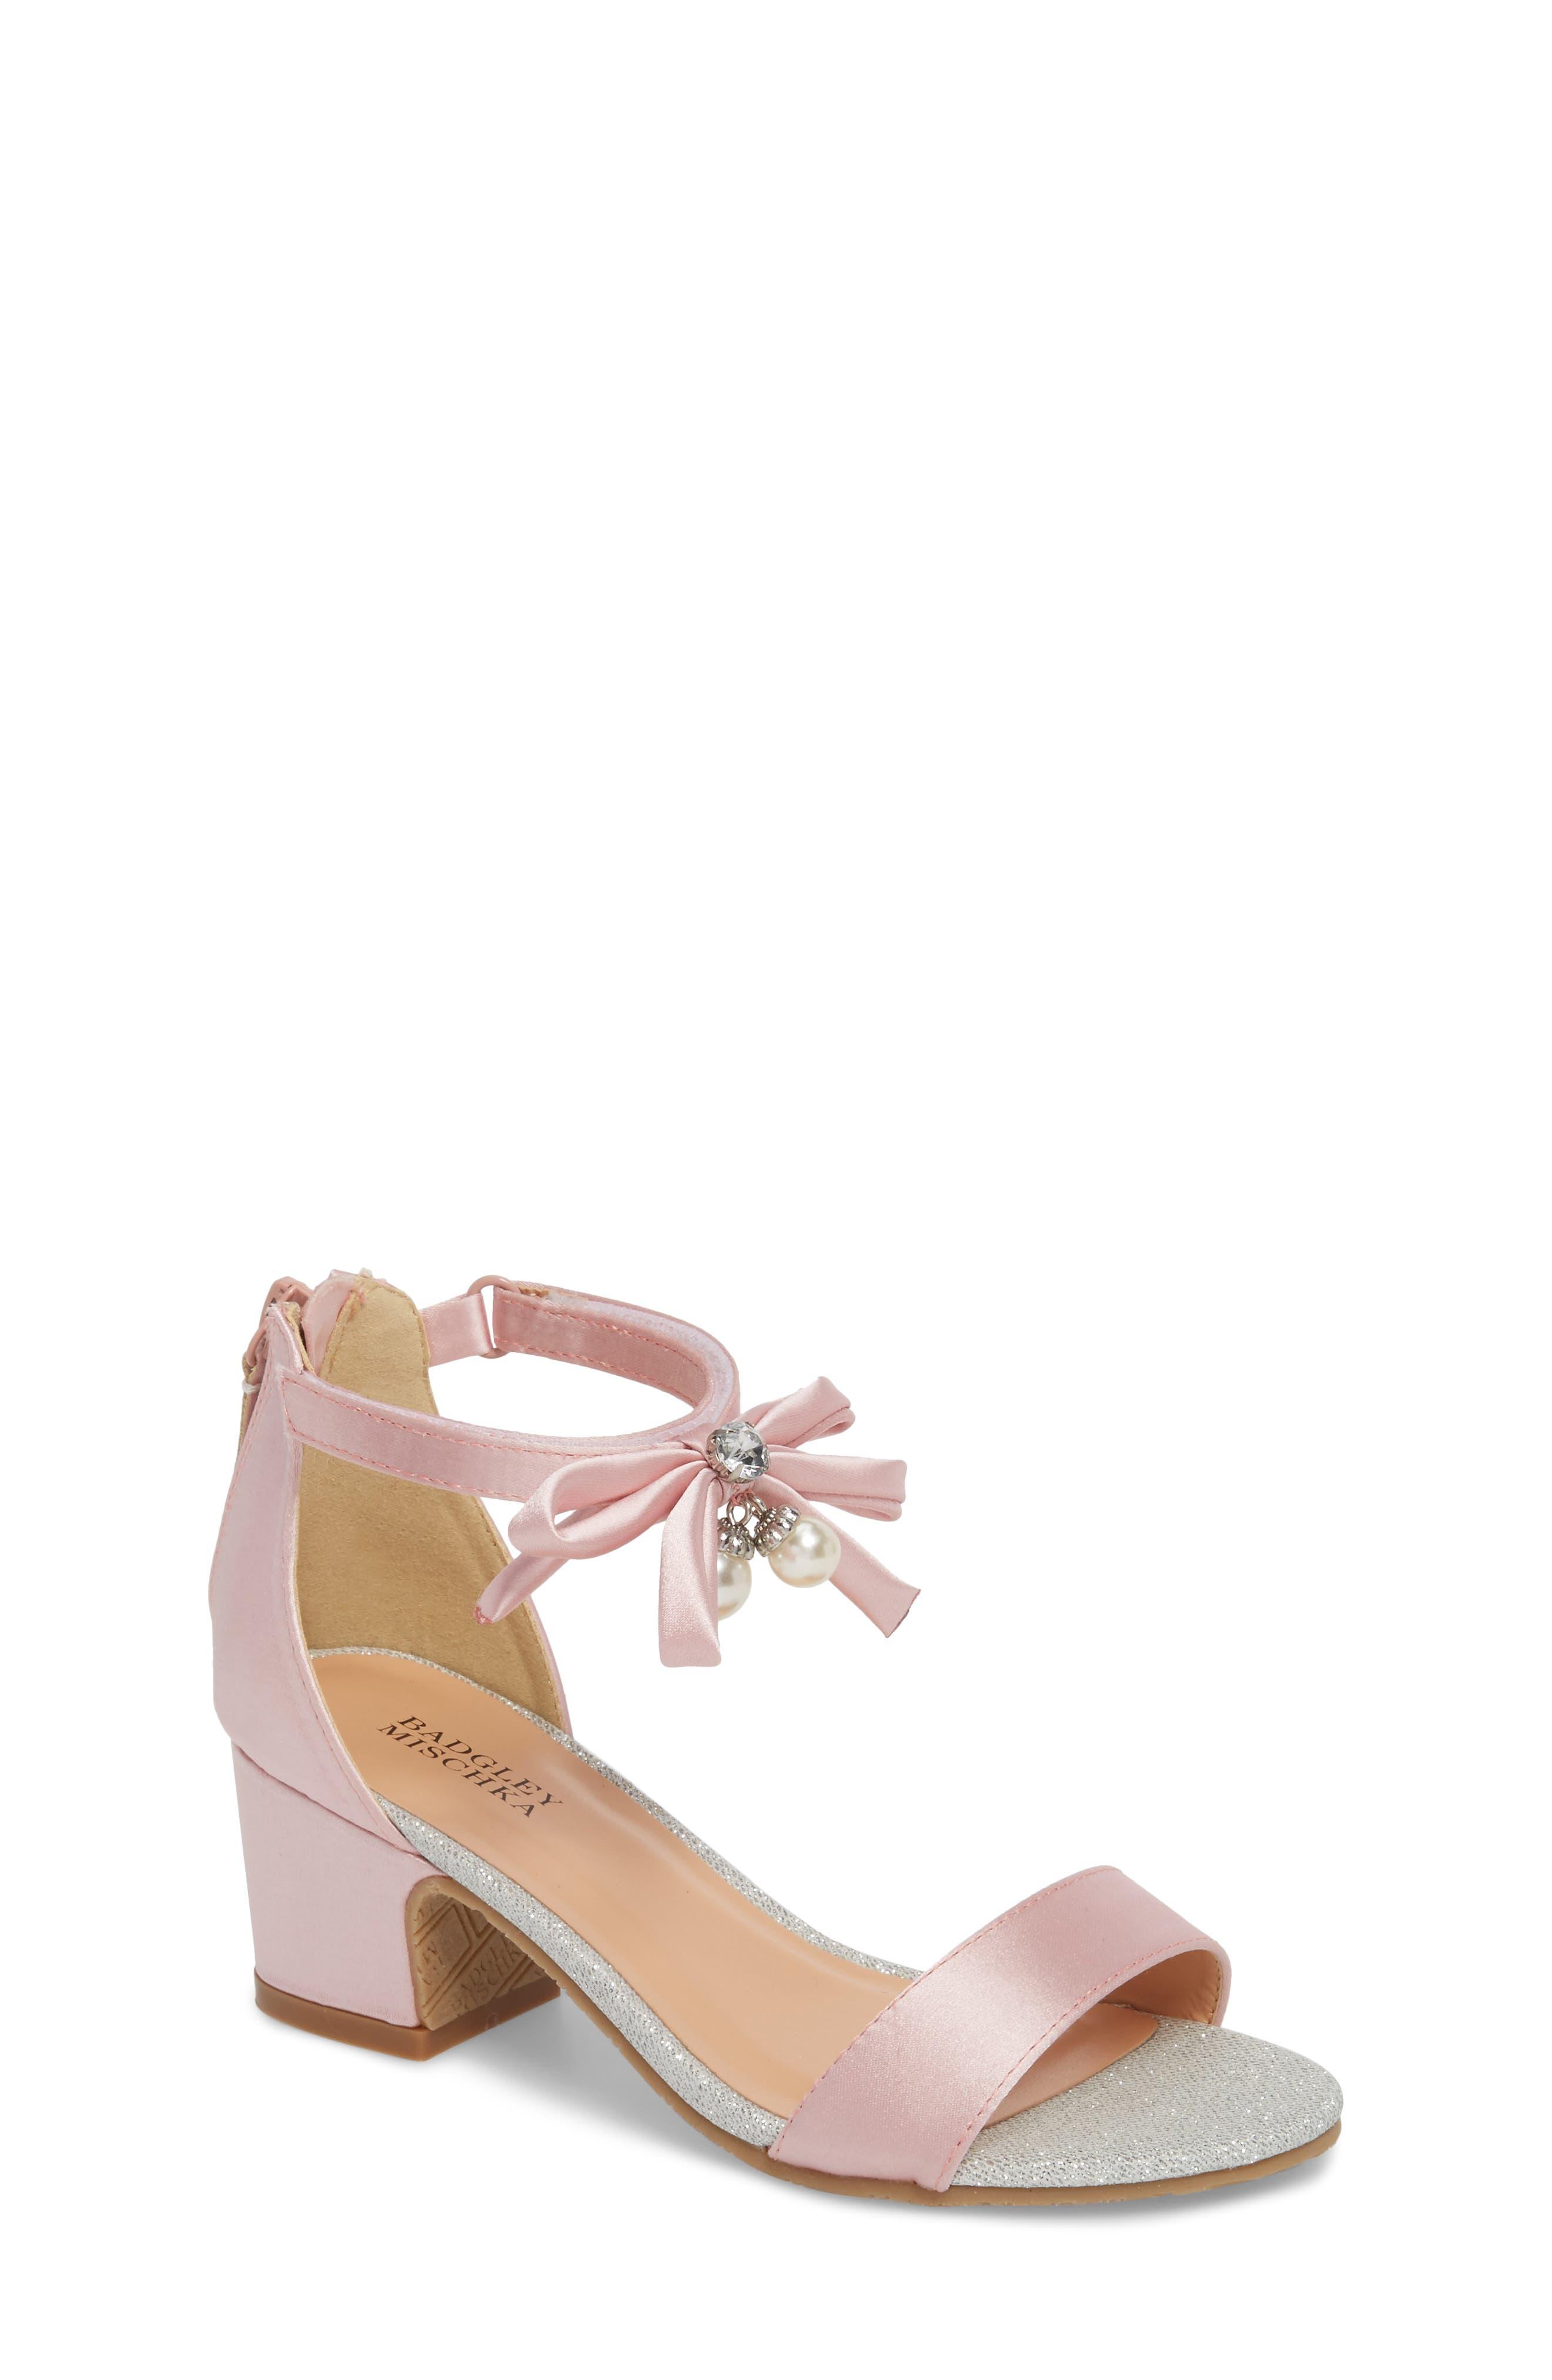 BADGLEY MISCHKA COLLECTION, Badgley Mischka Pernia Embellished Sandal, Main thumbnail 1, color, PINK/ SILVER